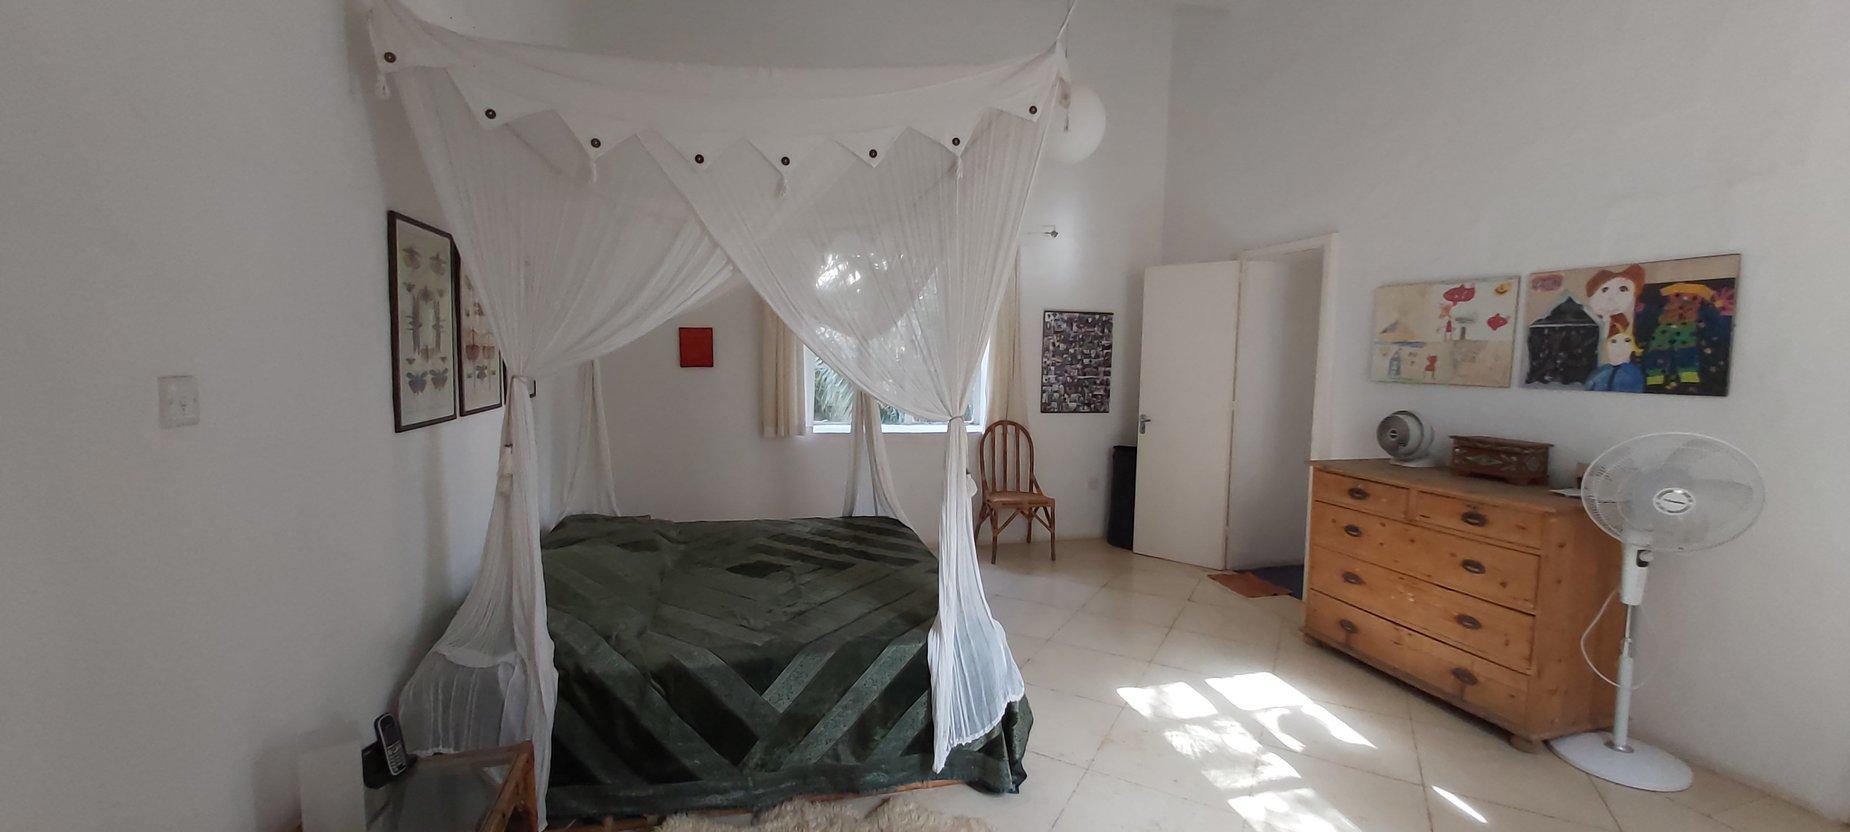 5 bed Town House For Sale in Lija, Lija - thumb 18